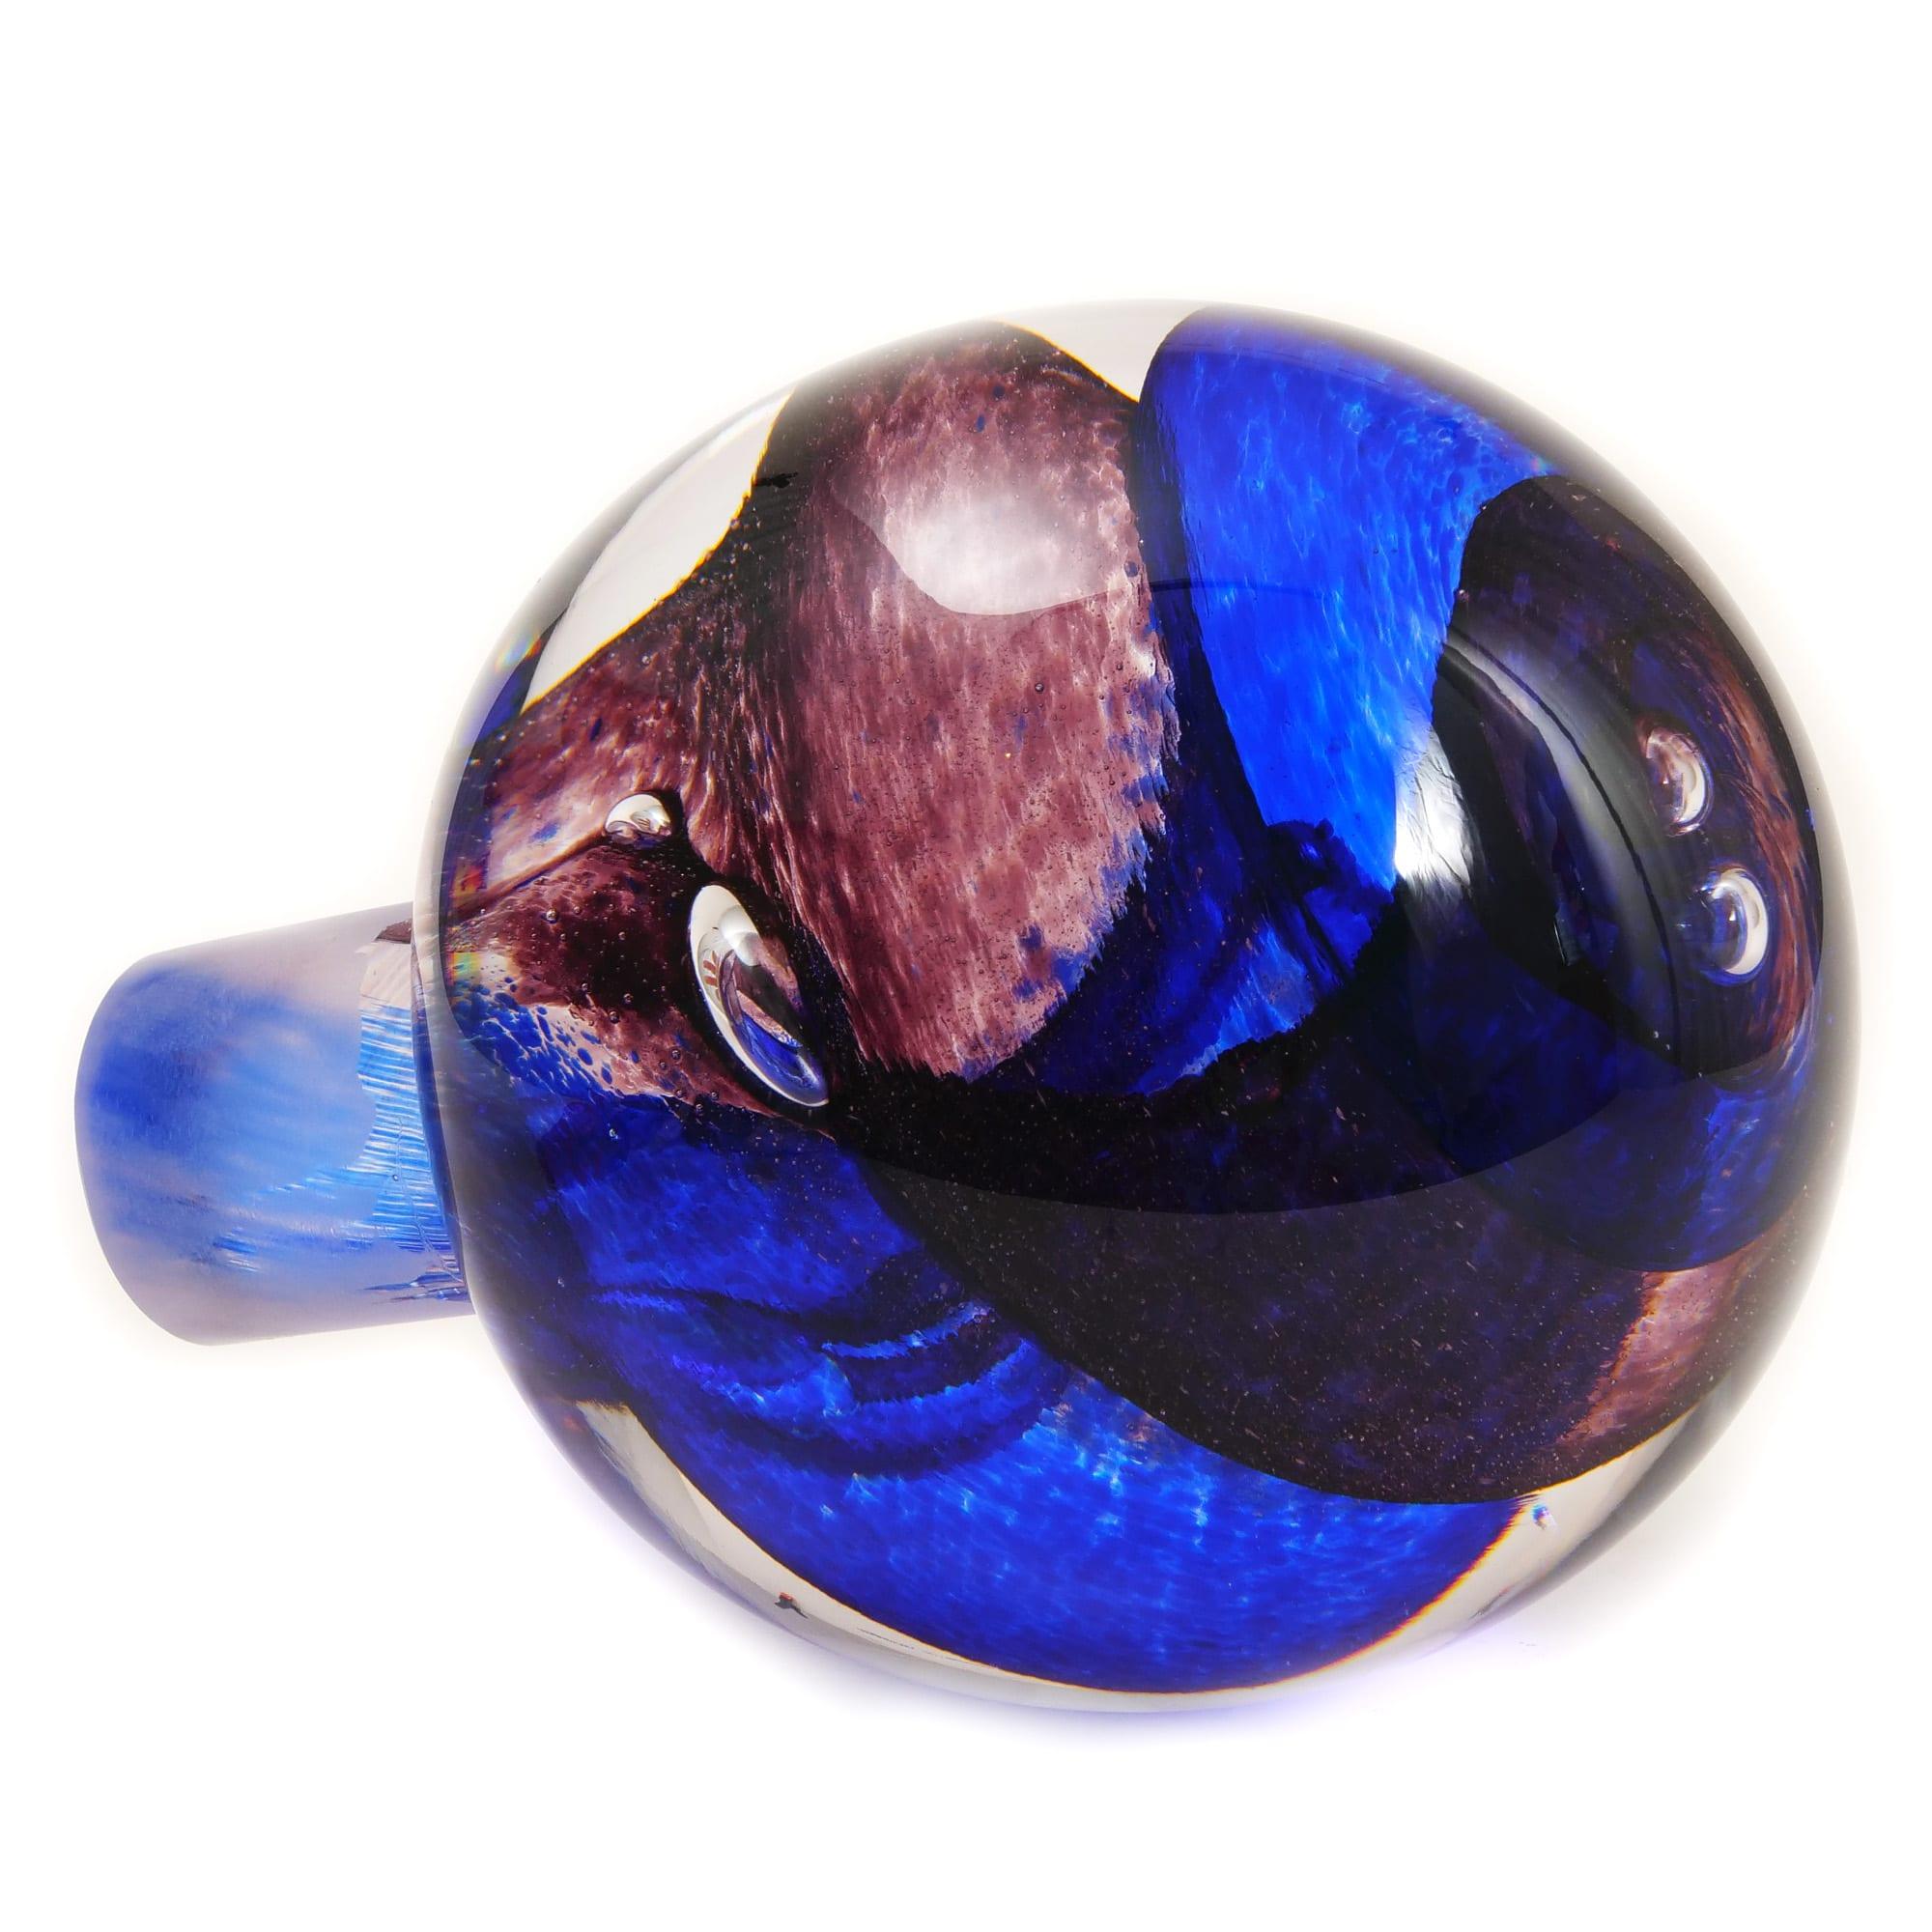 Spiral Banister Ball - Purple